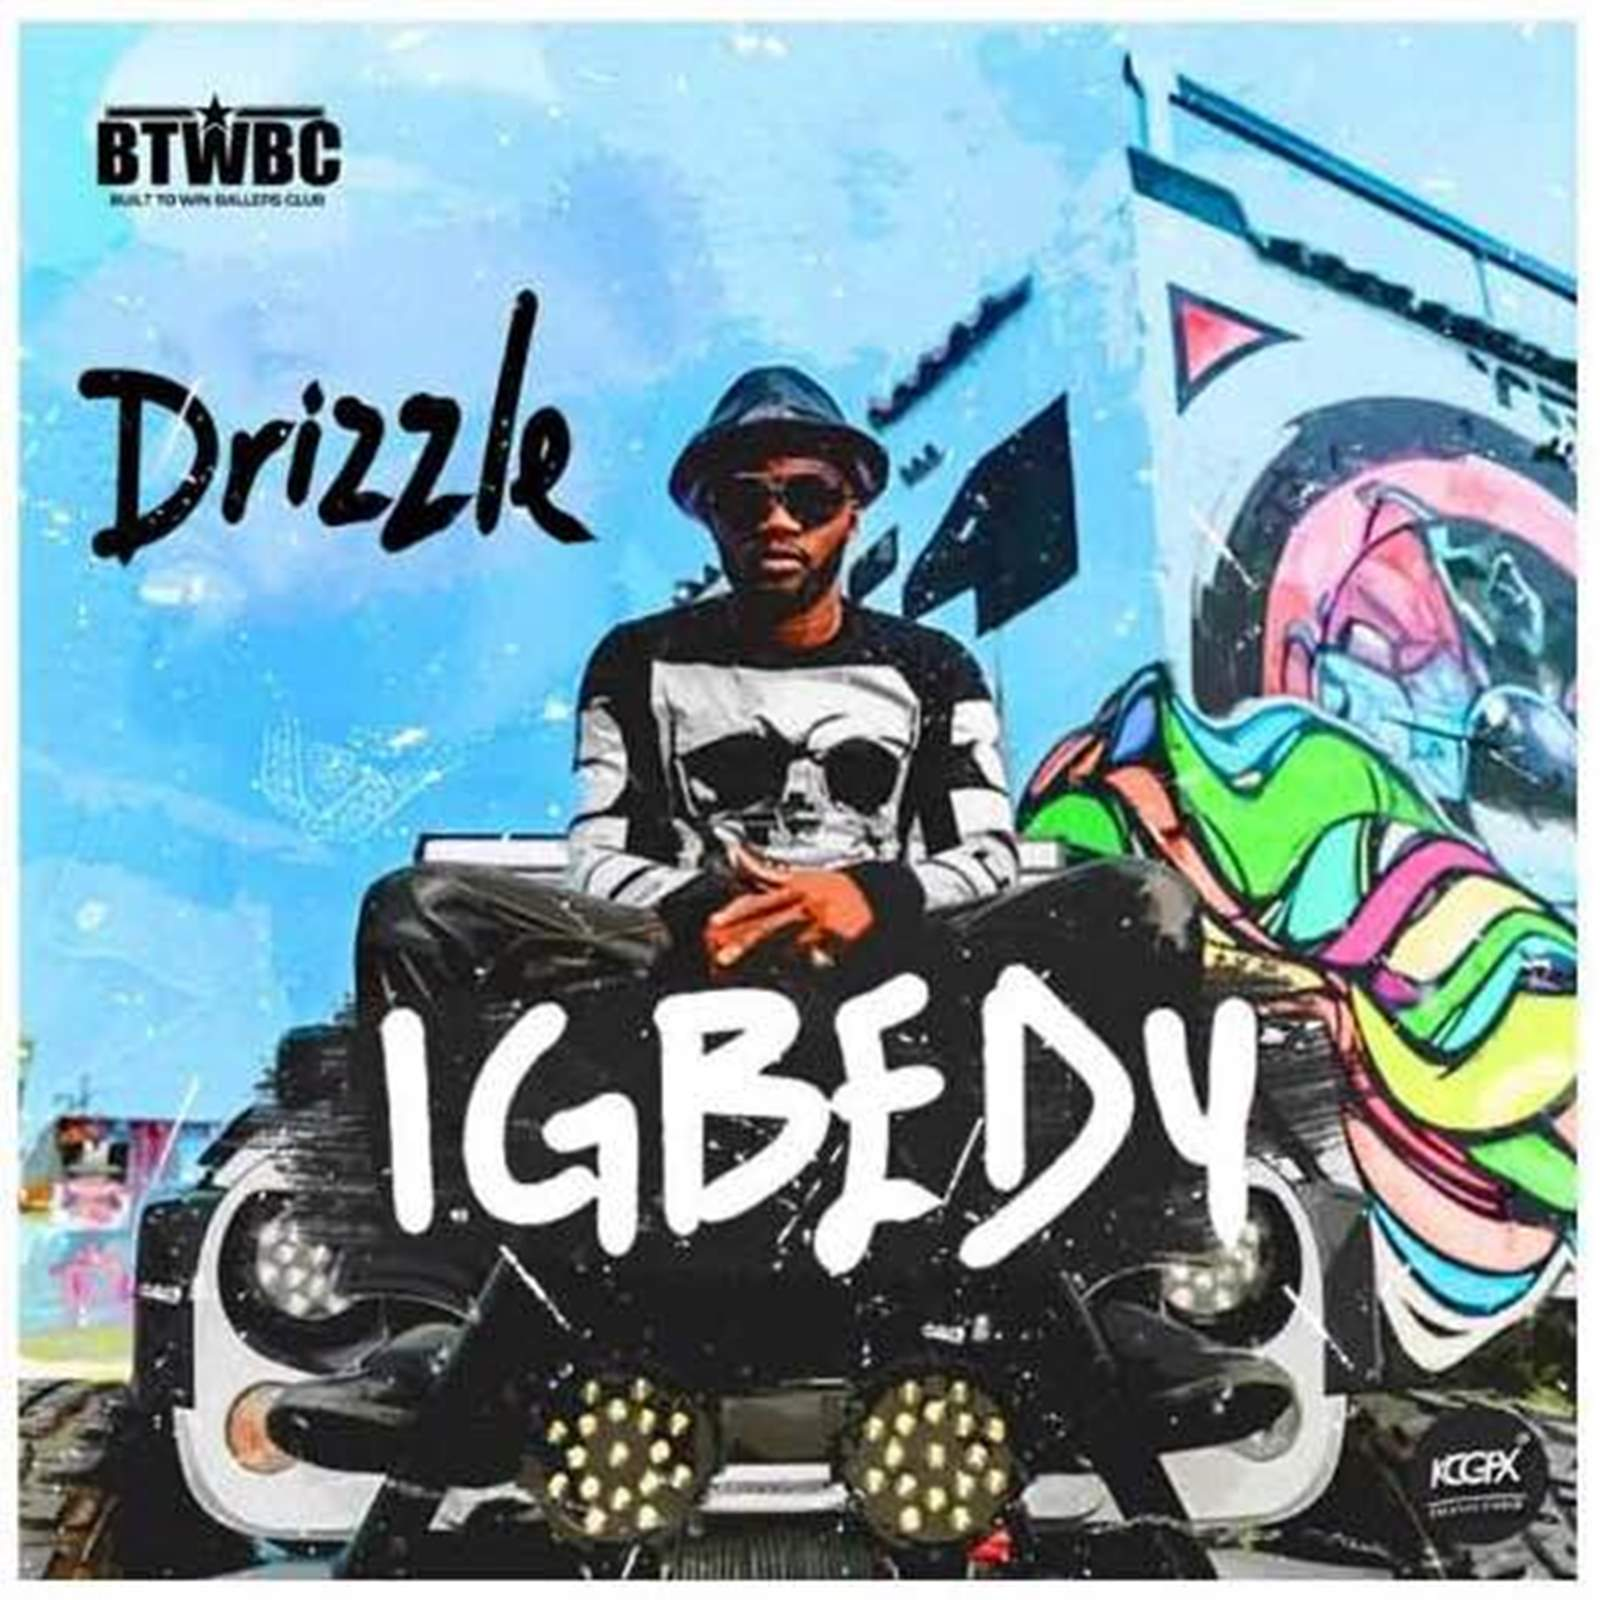 VIDEO: Drizzle – Igbedu